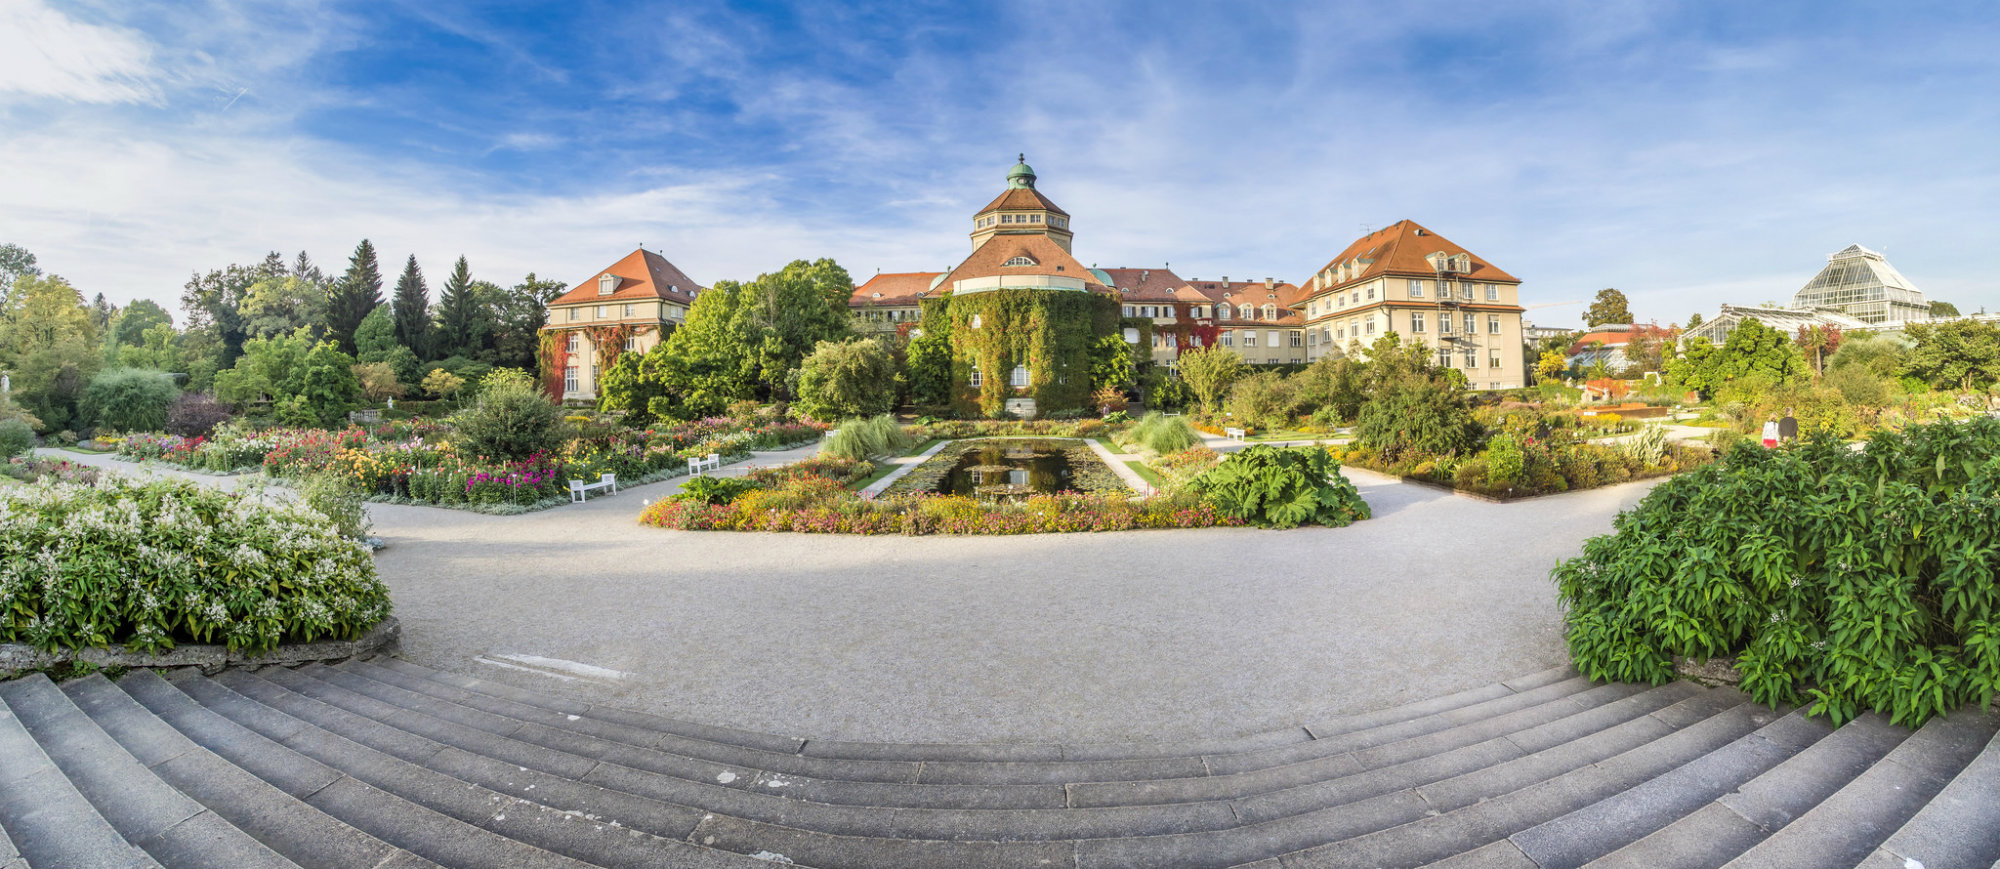 Munich parks